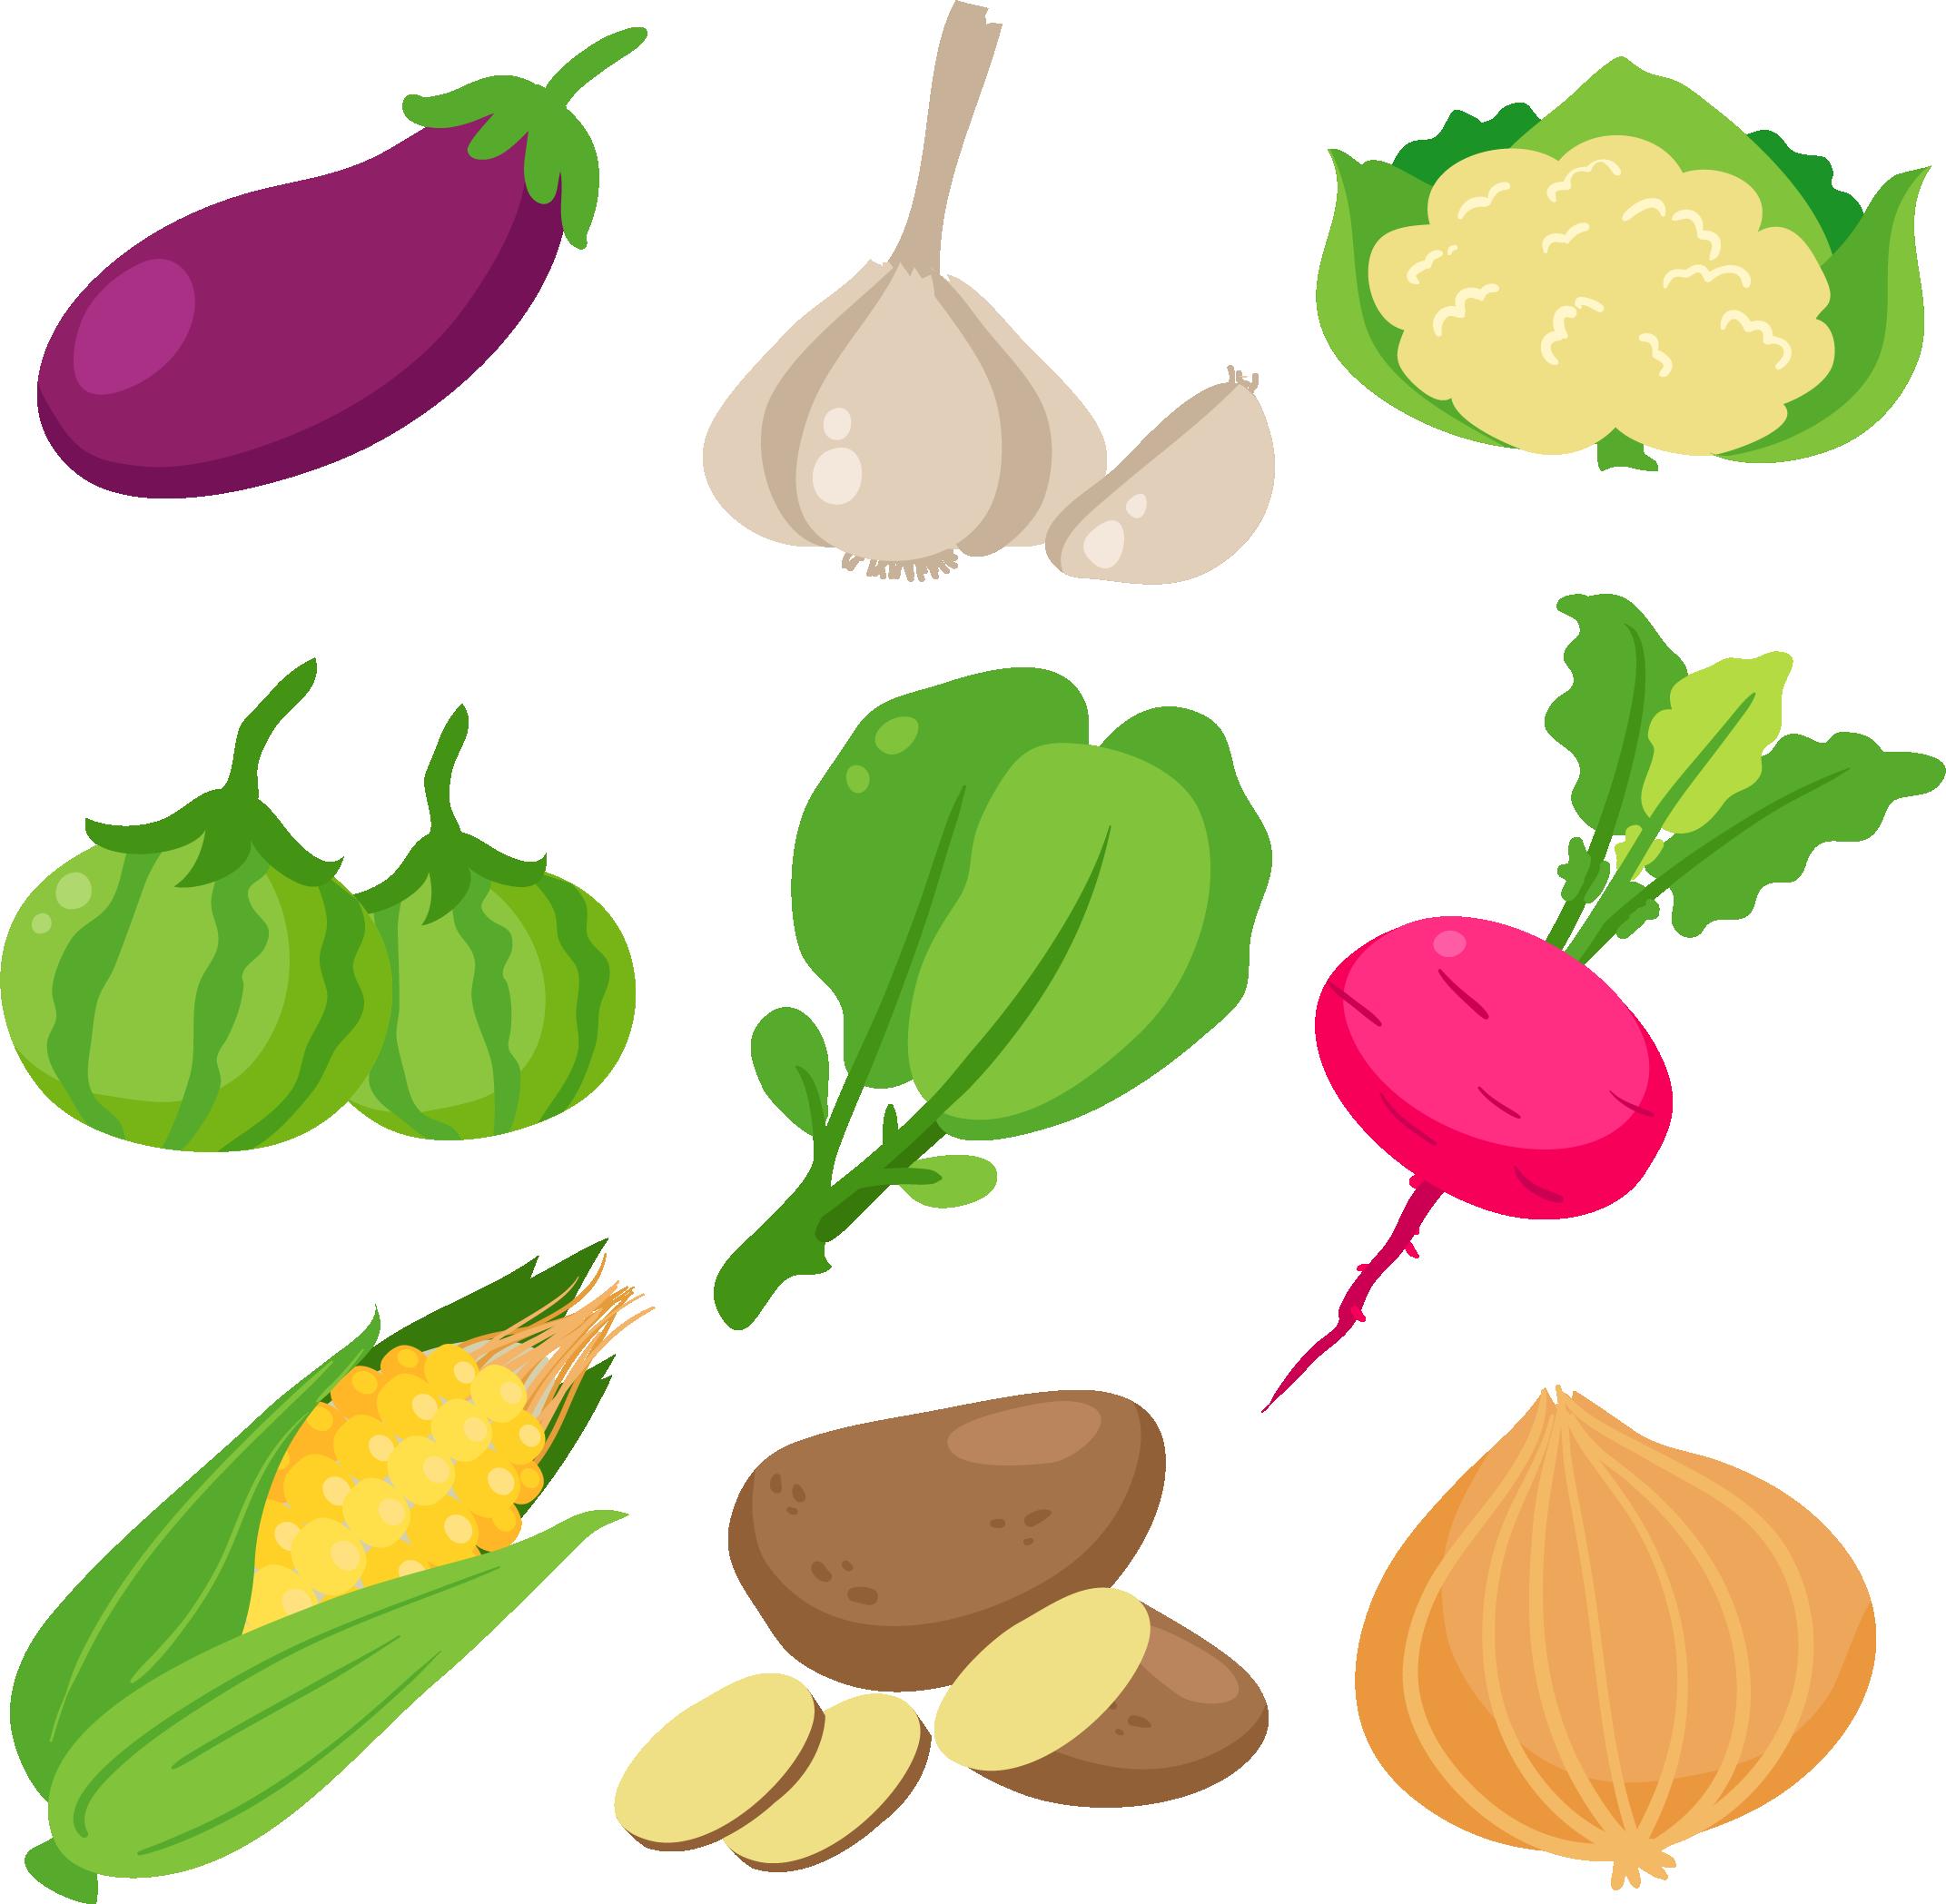 Leaf cartoon clip art. Clipart vegetables healthy vegetable